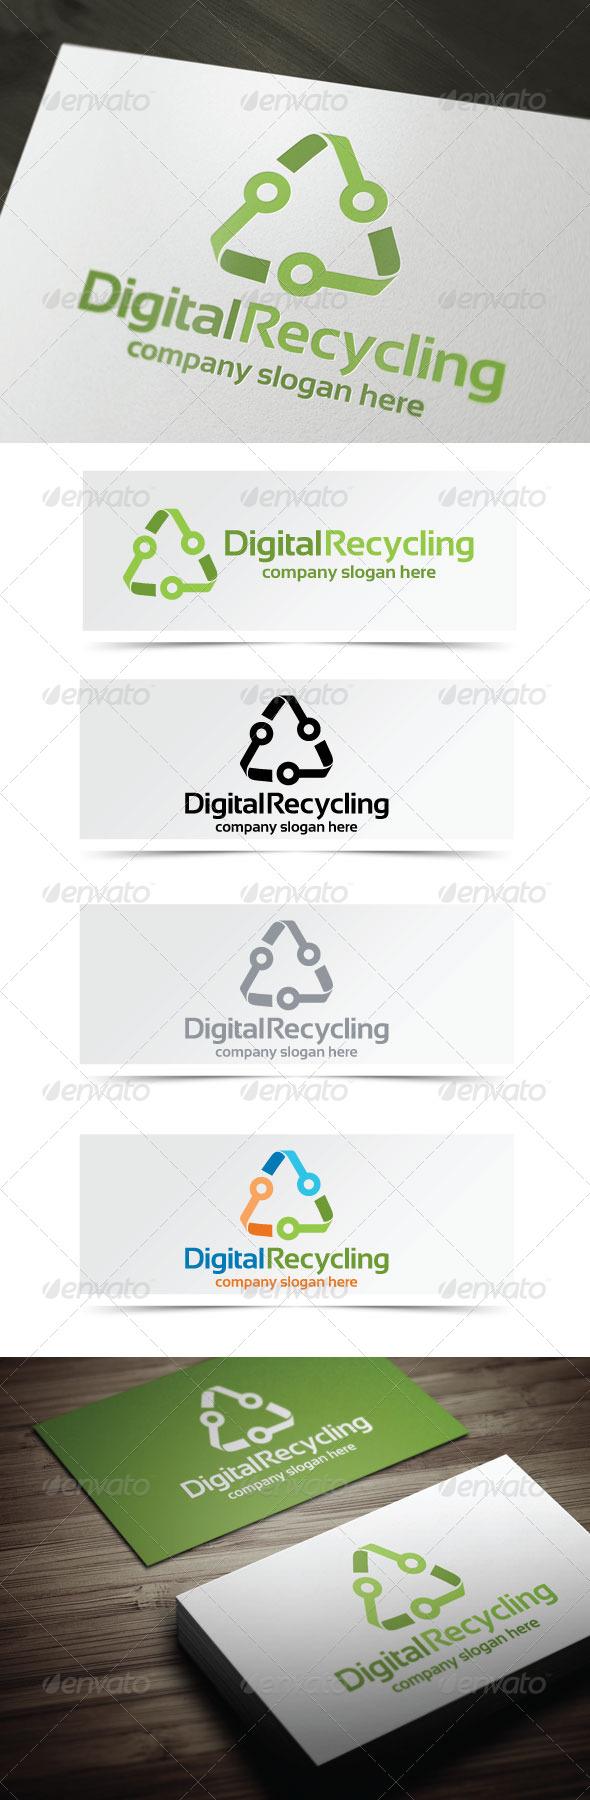 GraphicRiver Digital Recycling 4177511